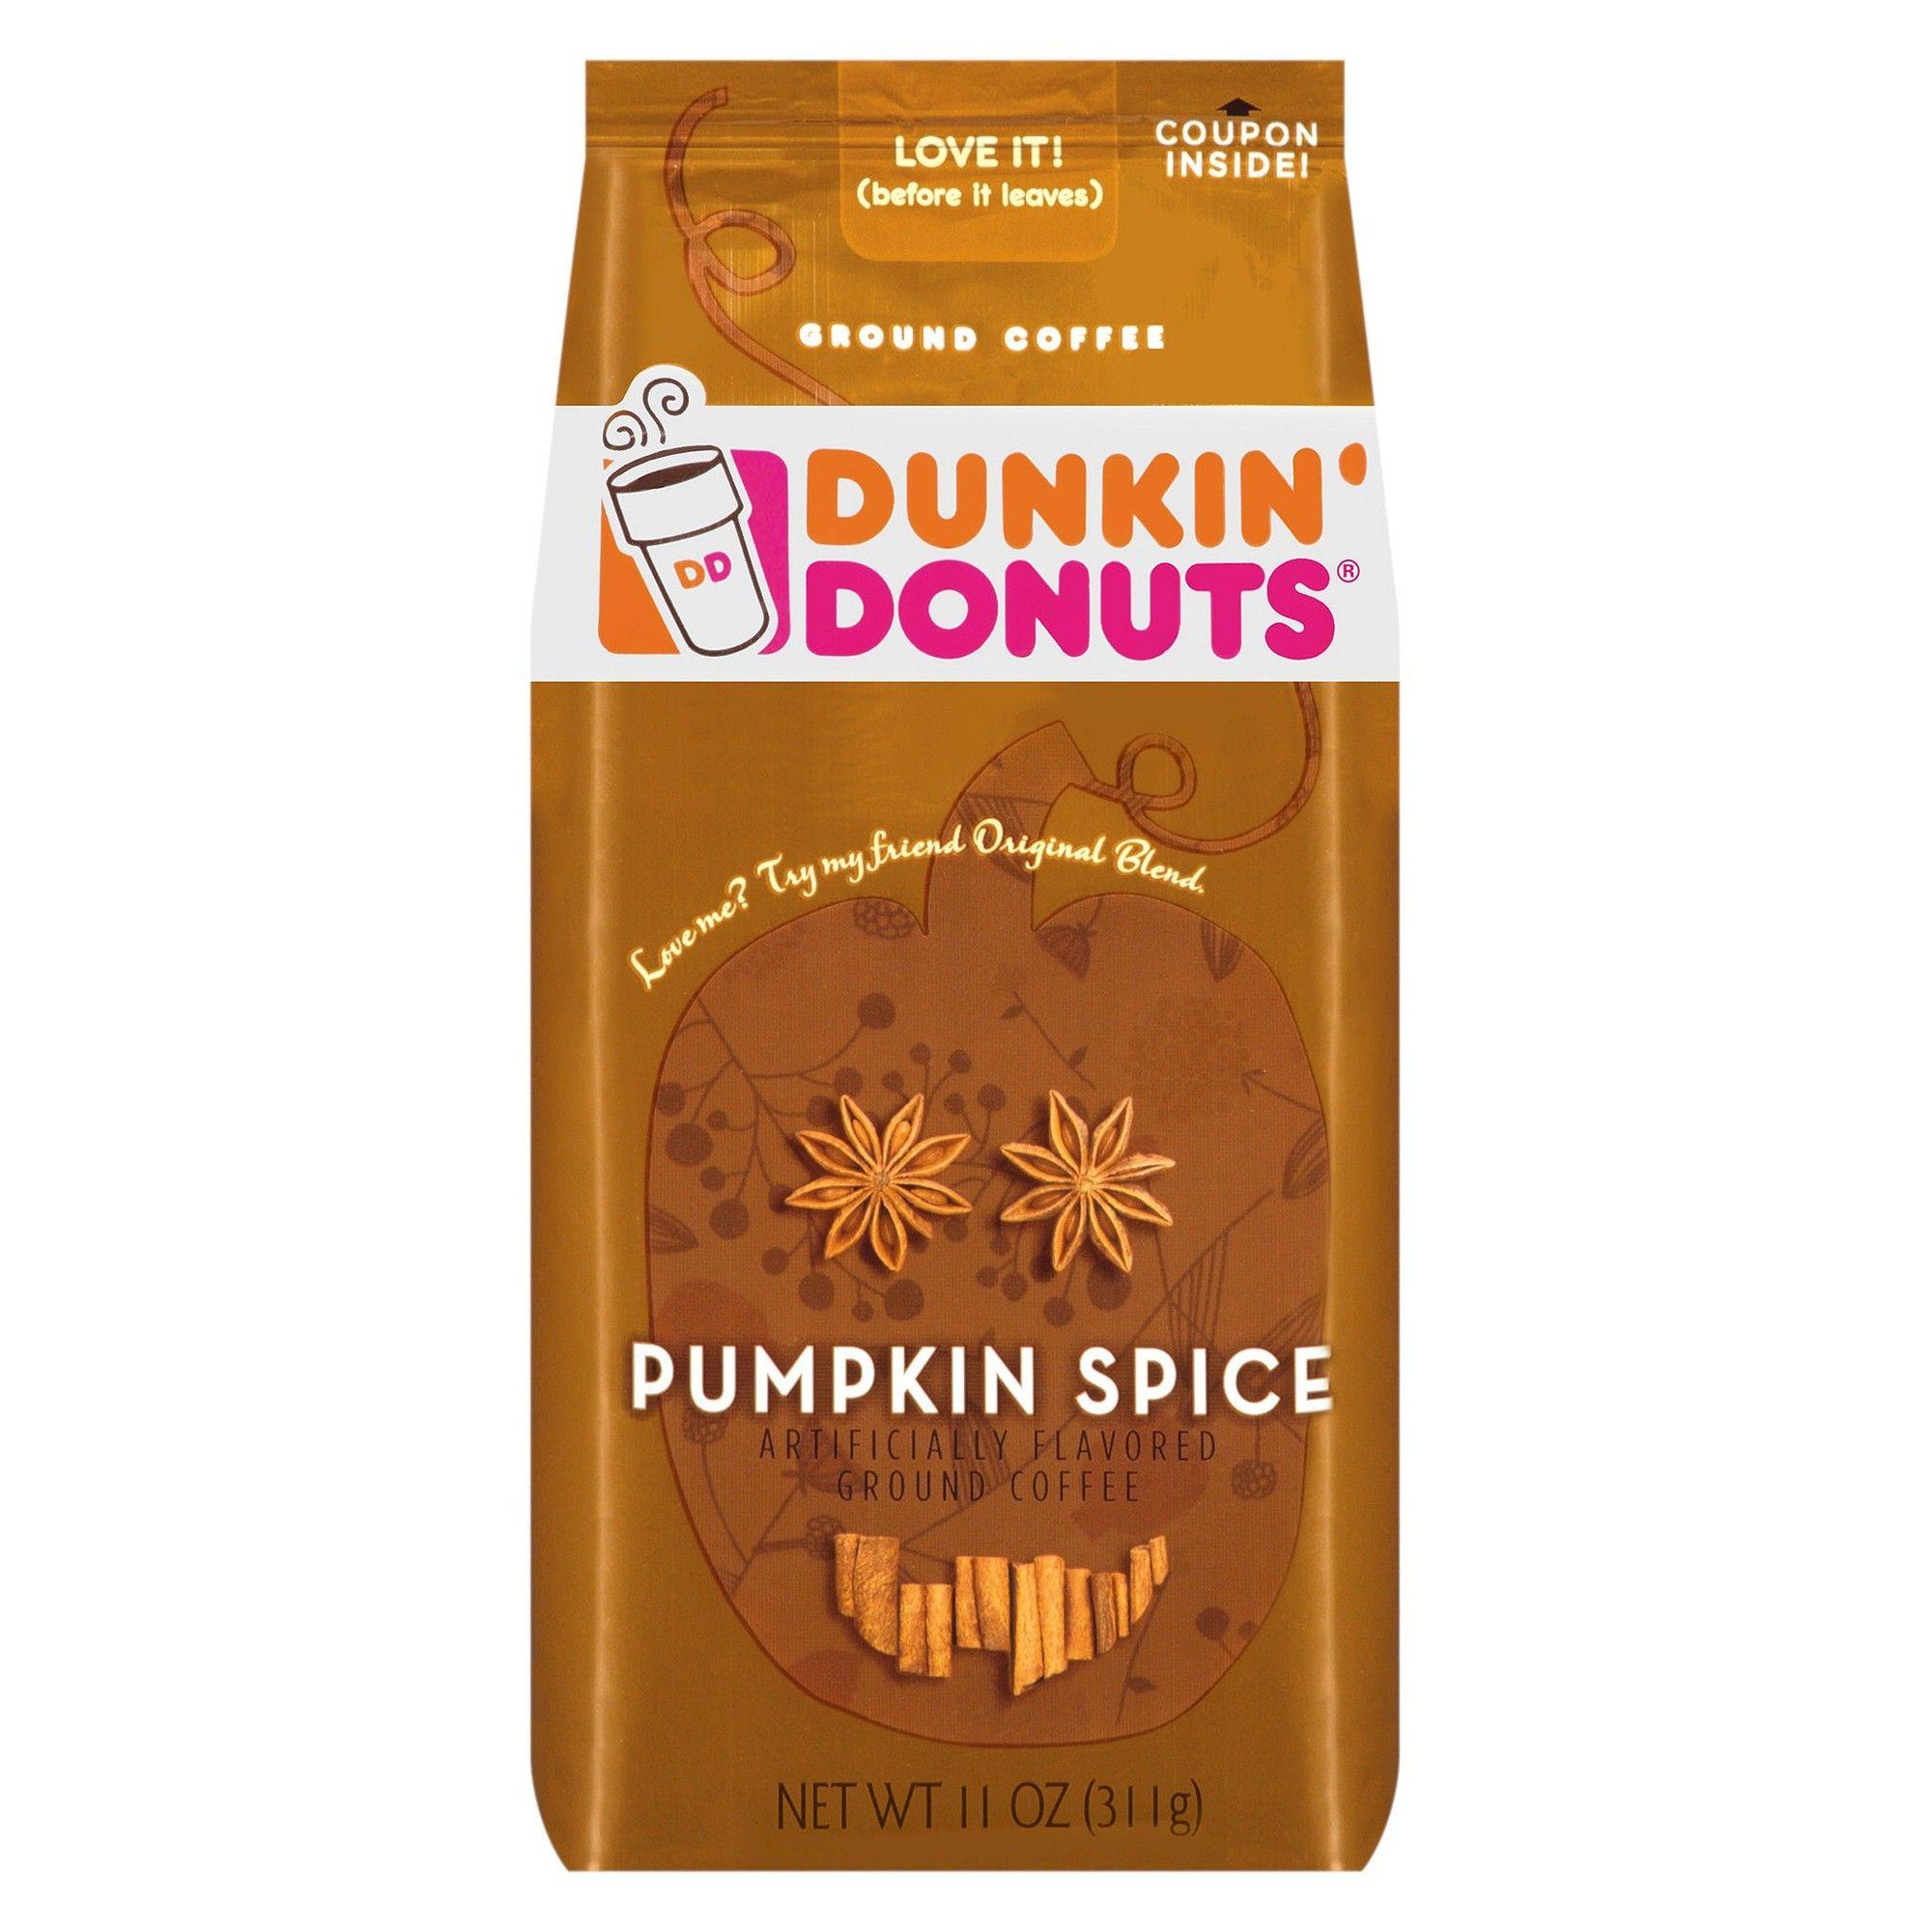 Dunkin' Donuts Pumpkin Spice Ground Coffee 11oz Dunkin